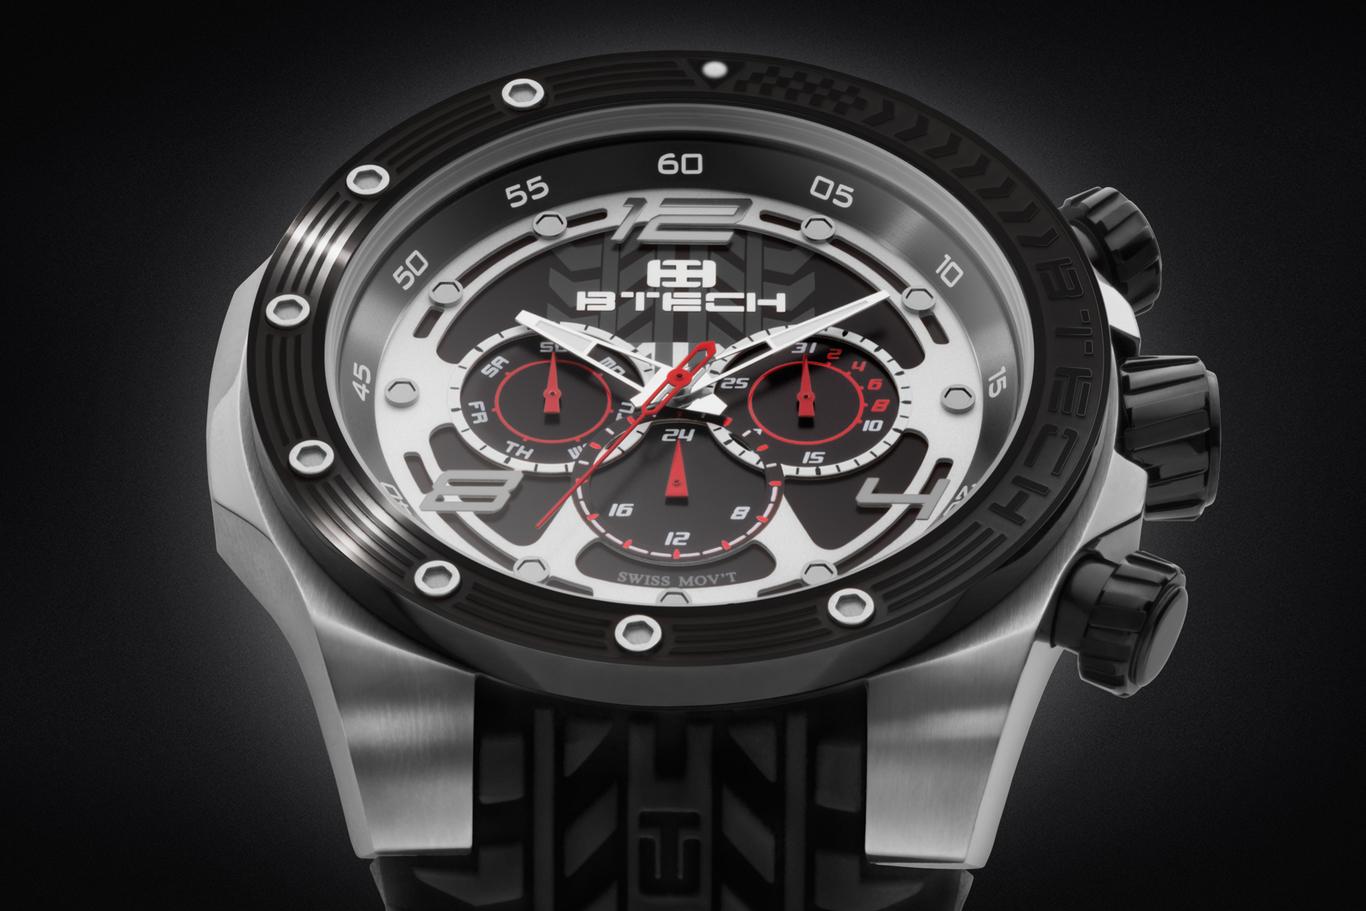 Tacorco btech watches 1 7e8fbcb8 zznz